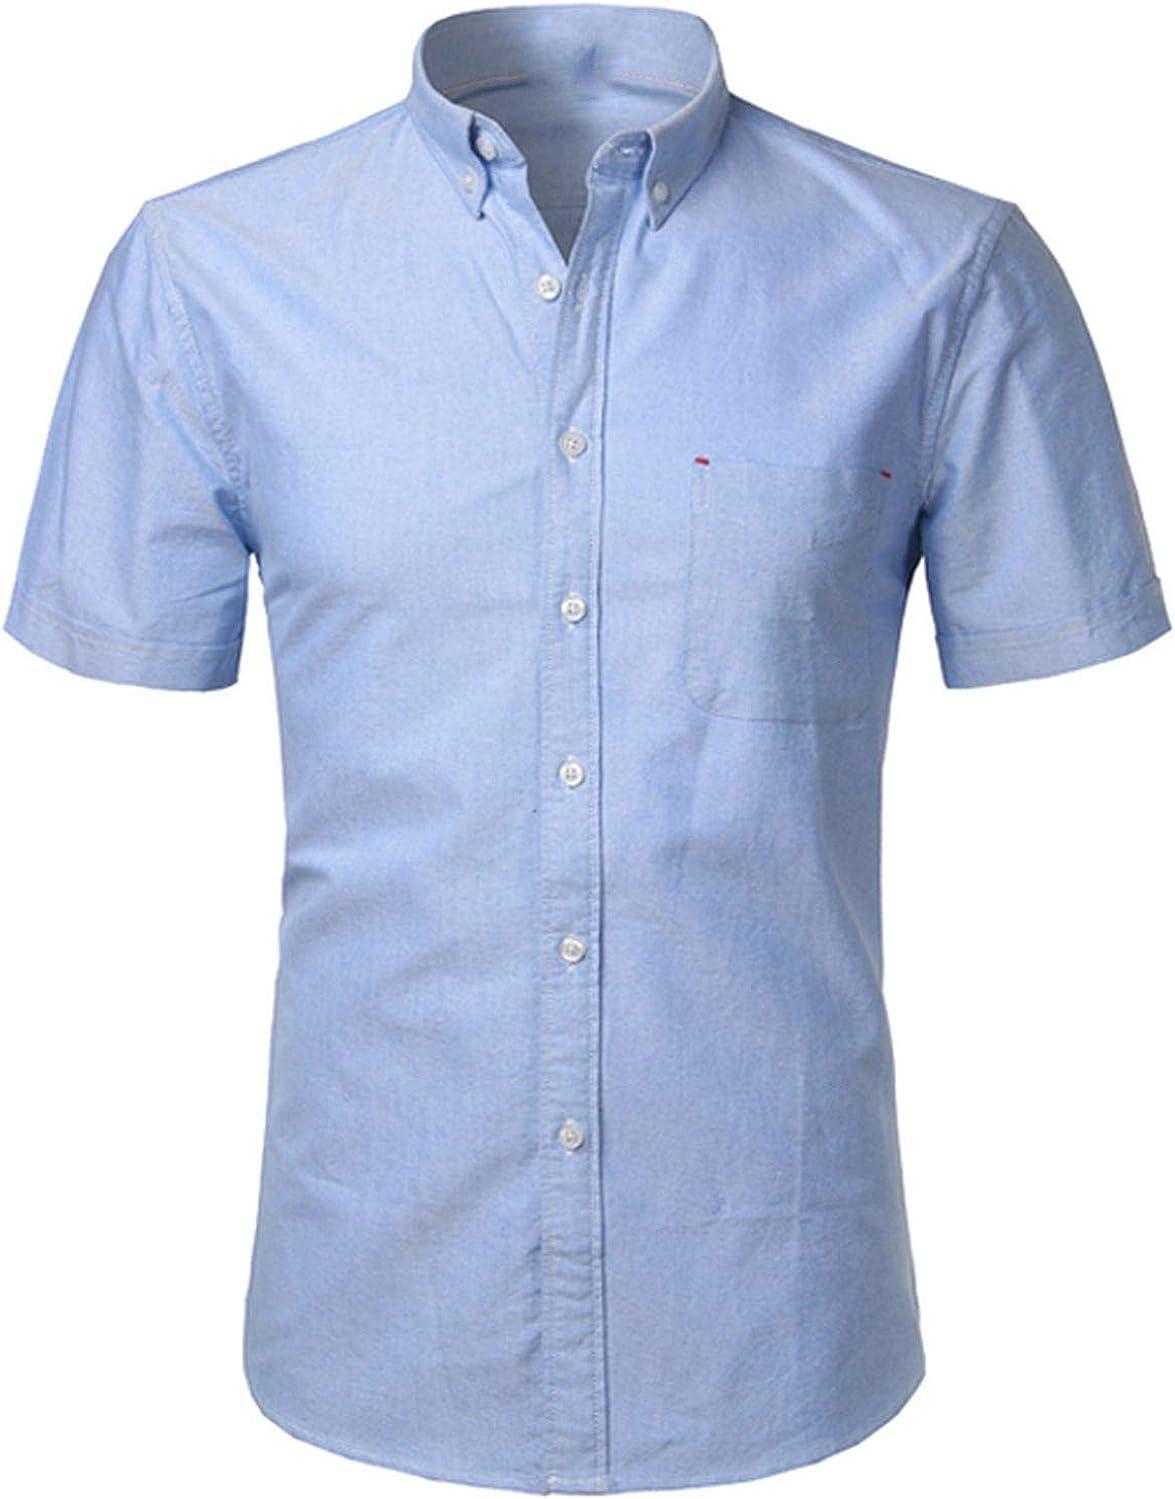 Mens Summer Short Sleeve Shirt Slim Casual Business Social Office Tops,Blue,5XL,United States